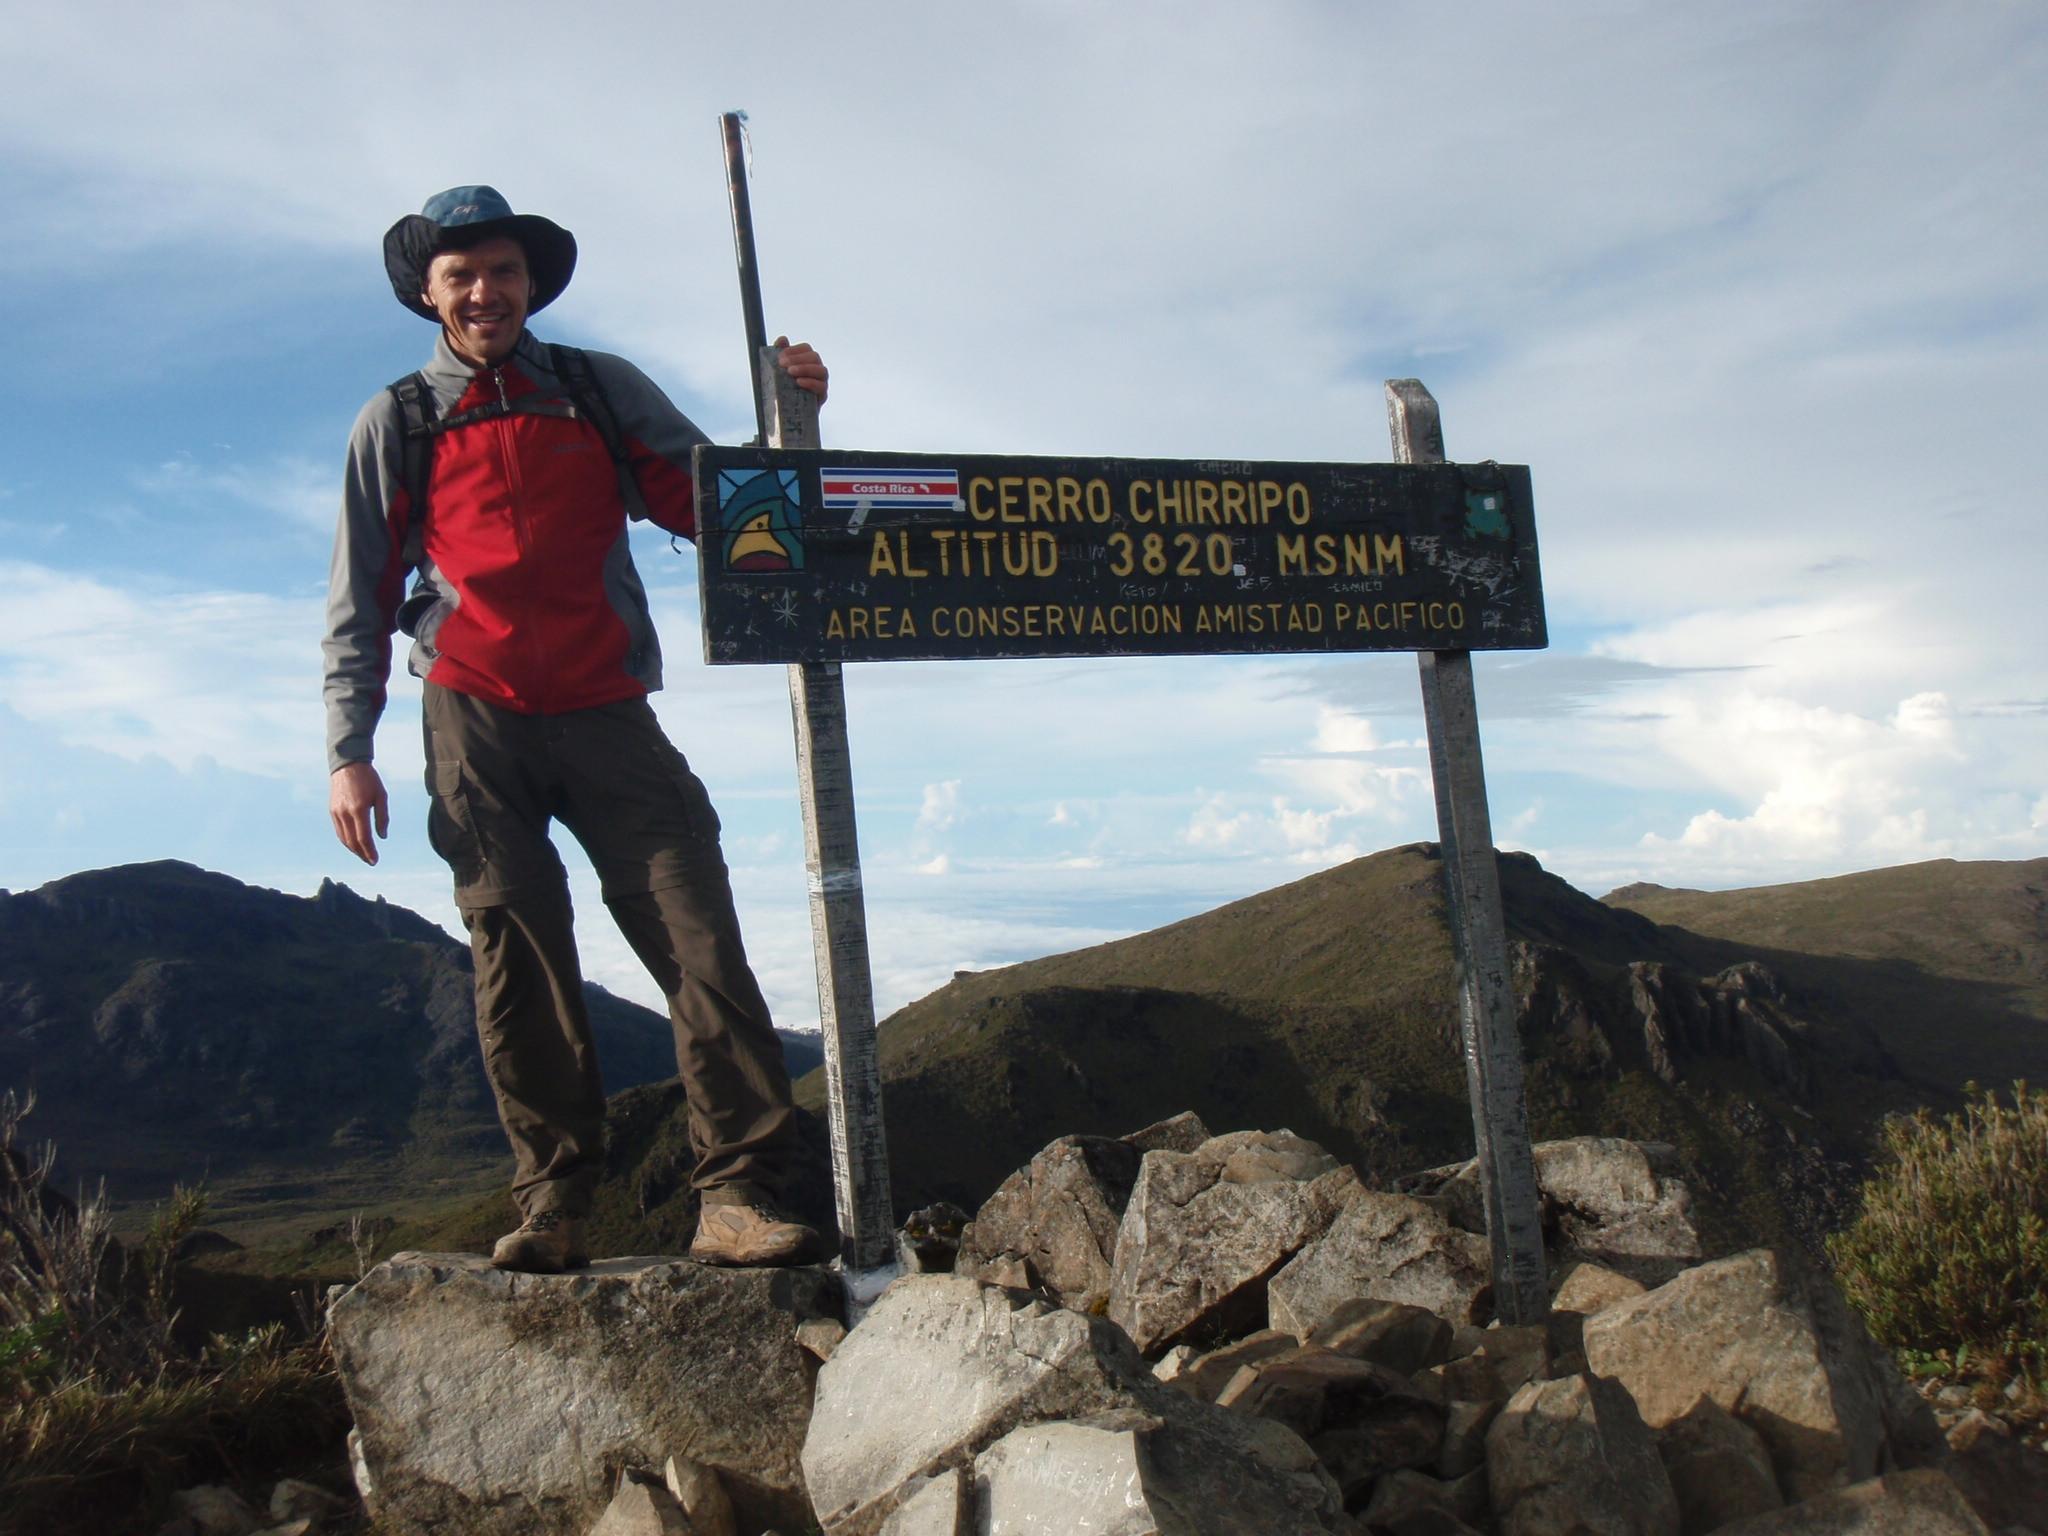 On the summit of Cerro Chirripo, highest point in Costa Rica